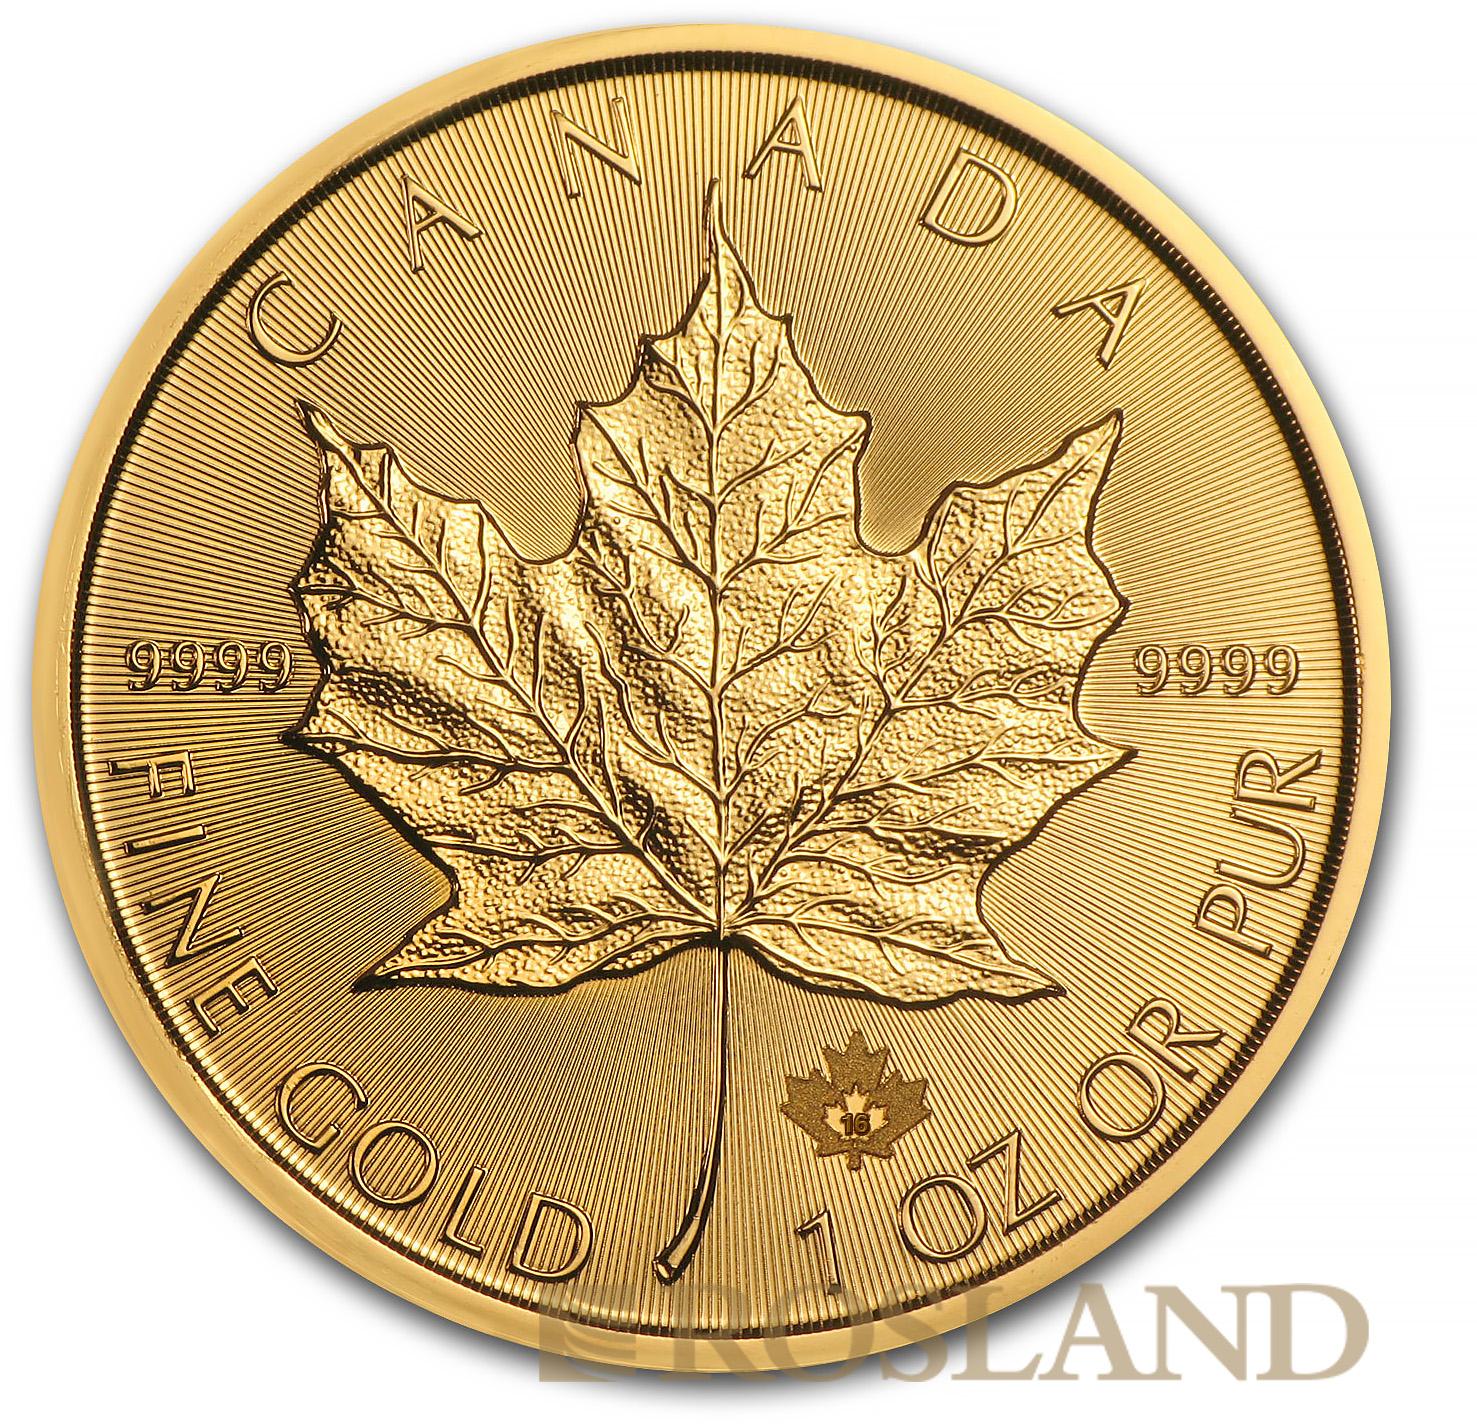 1 Unze Goldmünze Kanada Maple Leaf 2016